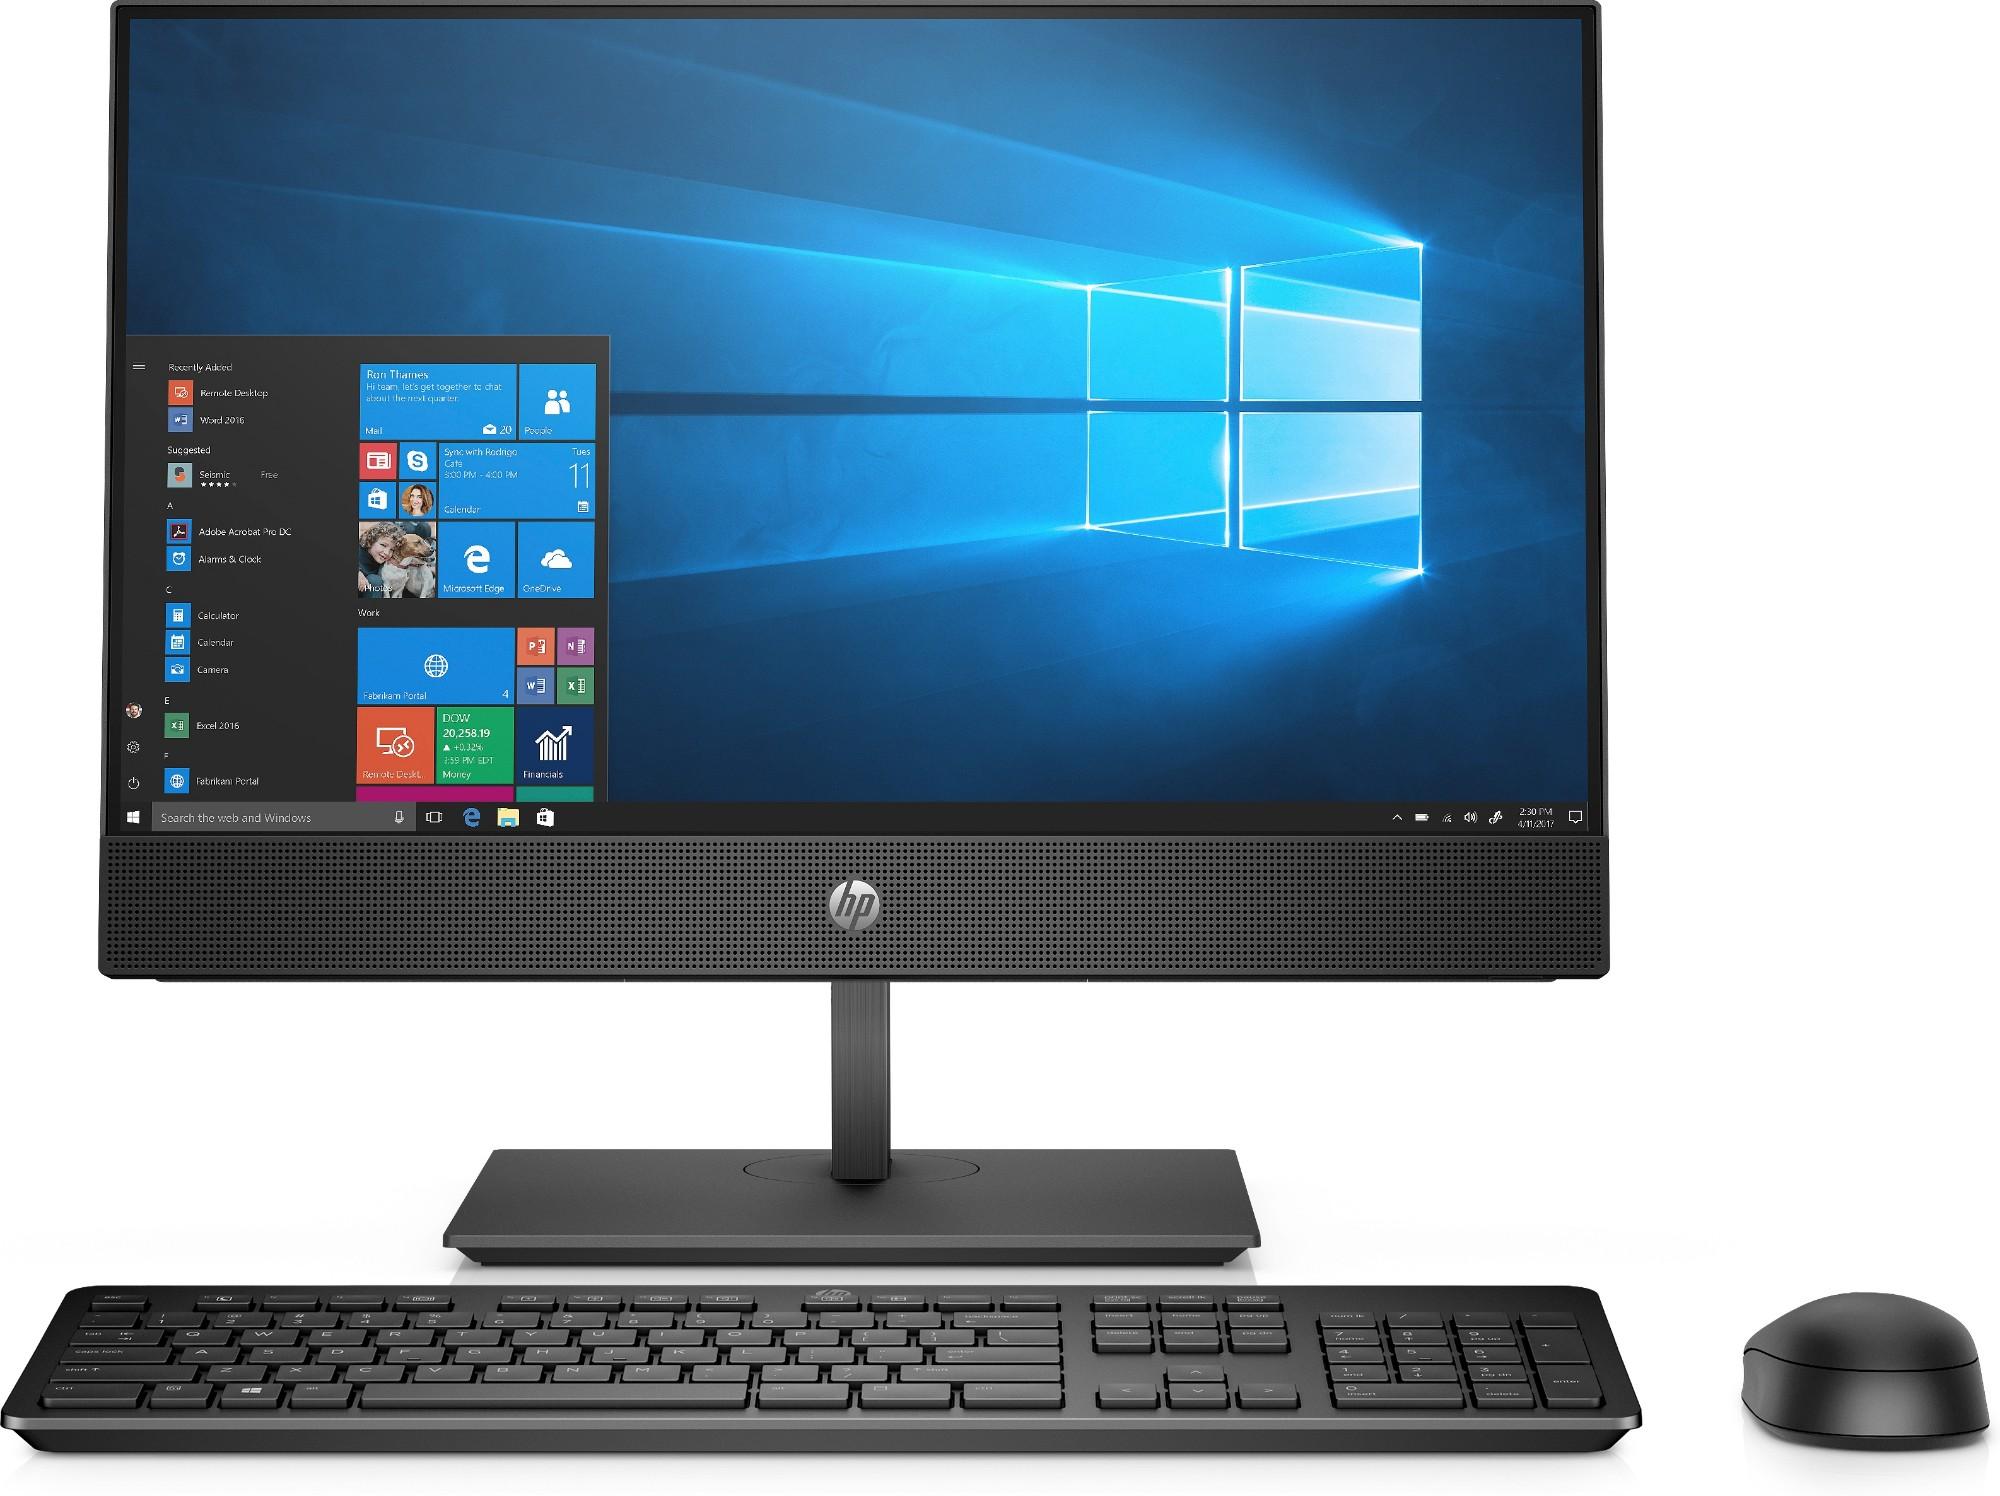 HP ProOne 600 G4 3.6GHz i3-8100 8th gen Intel® Core™ i3 21.5